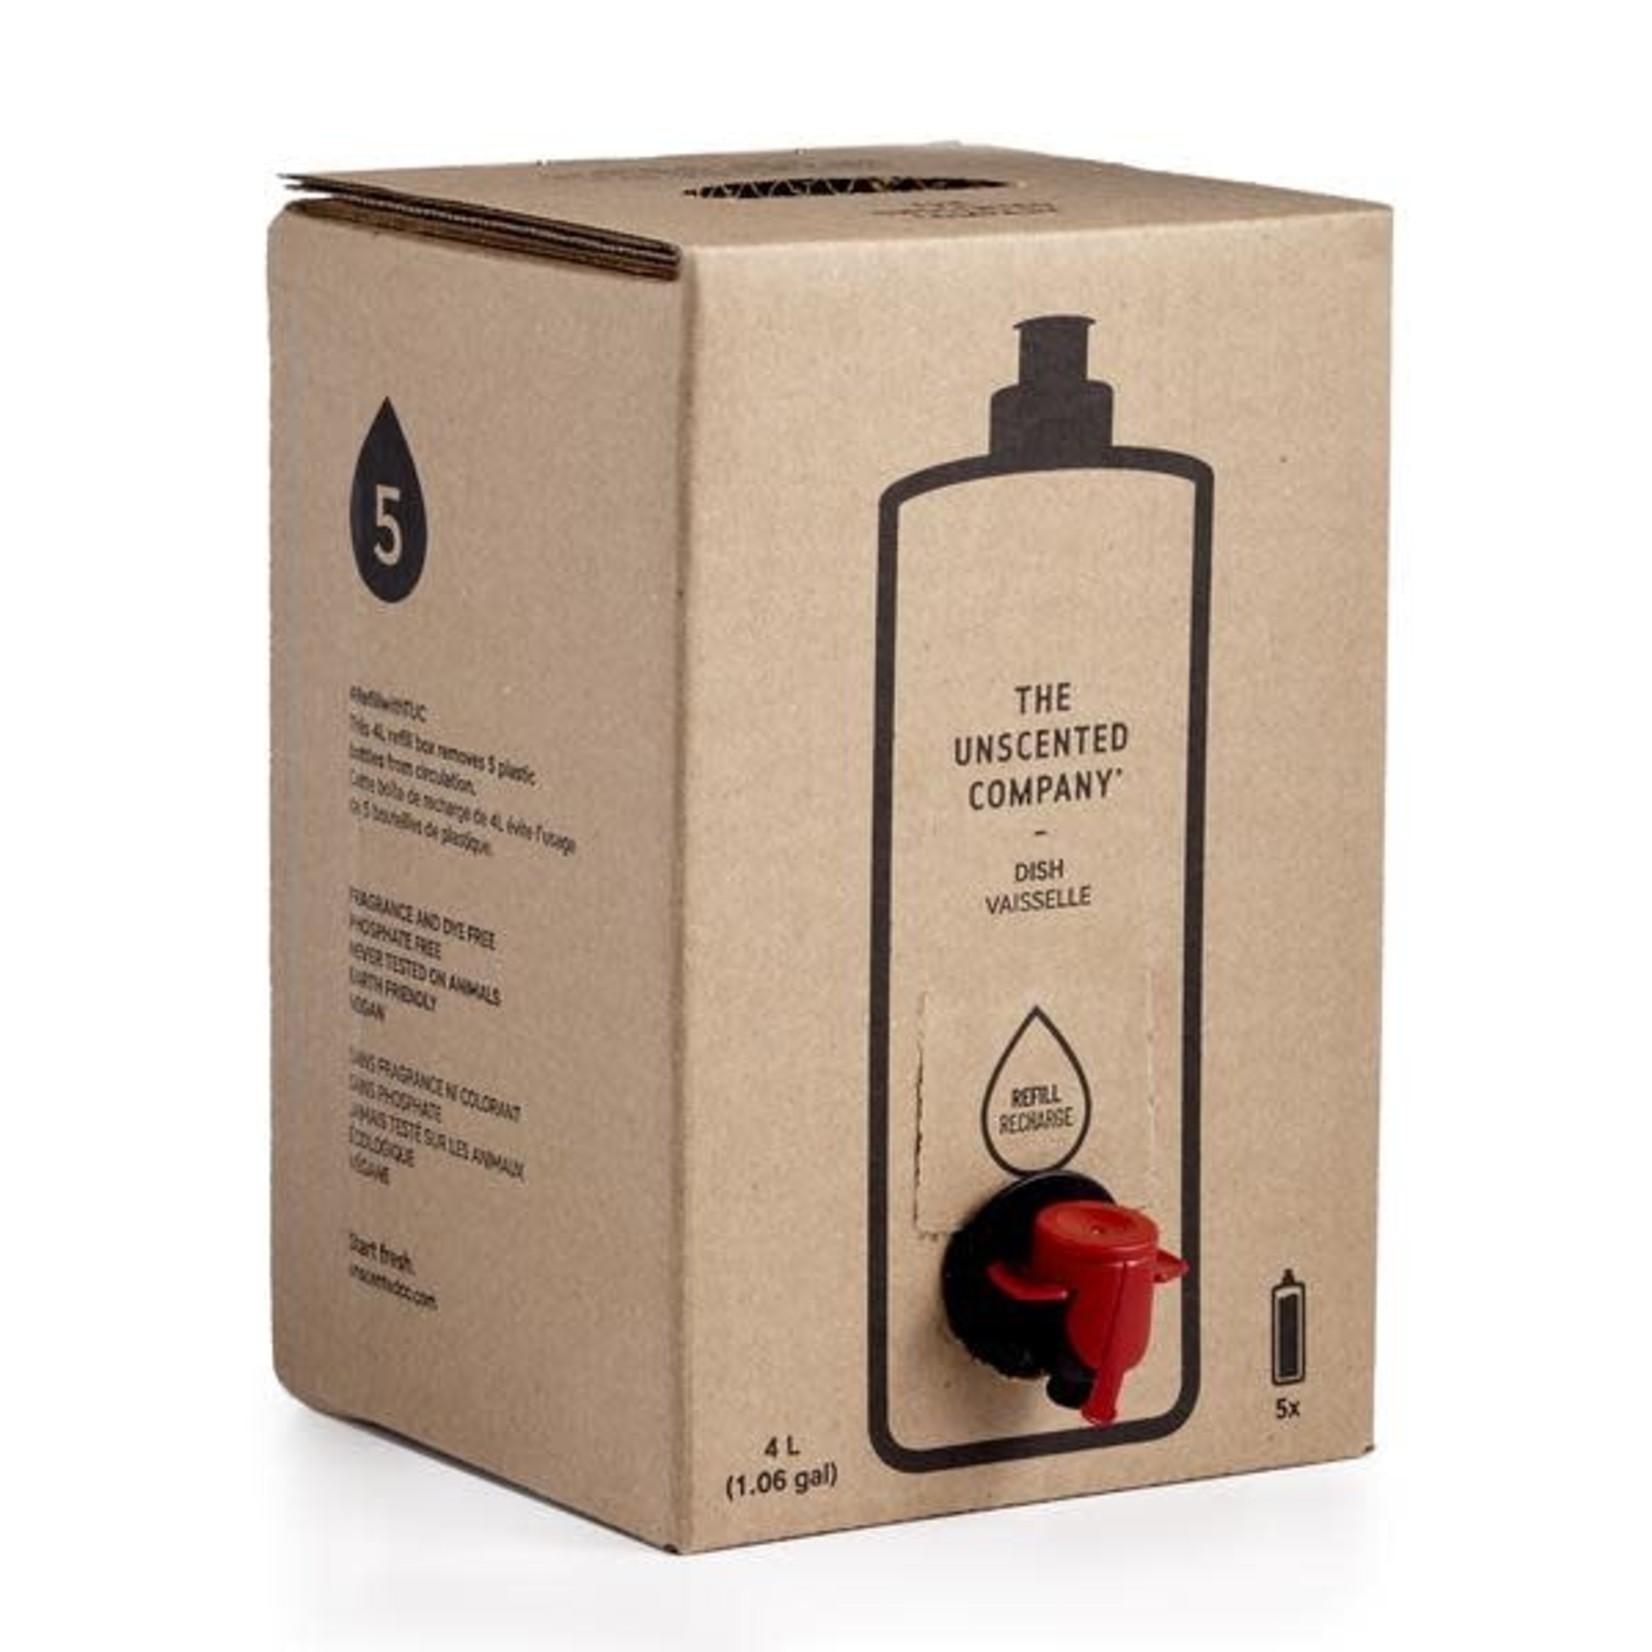 THE UNSCENTED COMPANY DISH SOAP - 4L REFILLABLE BOX